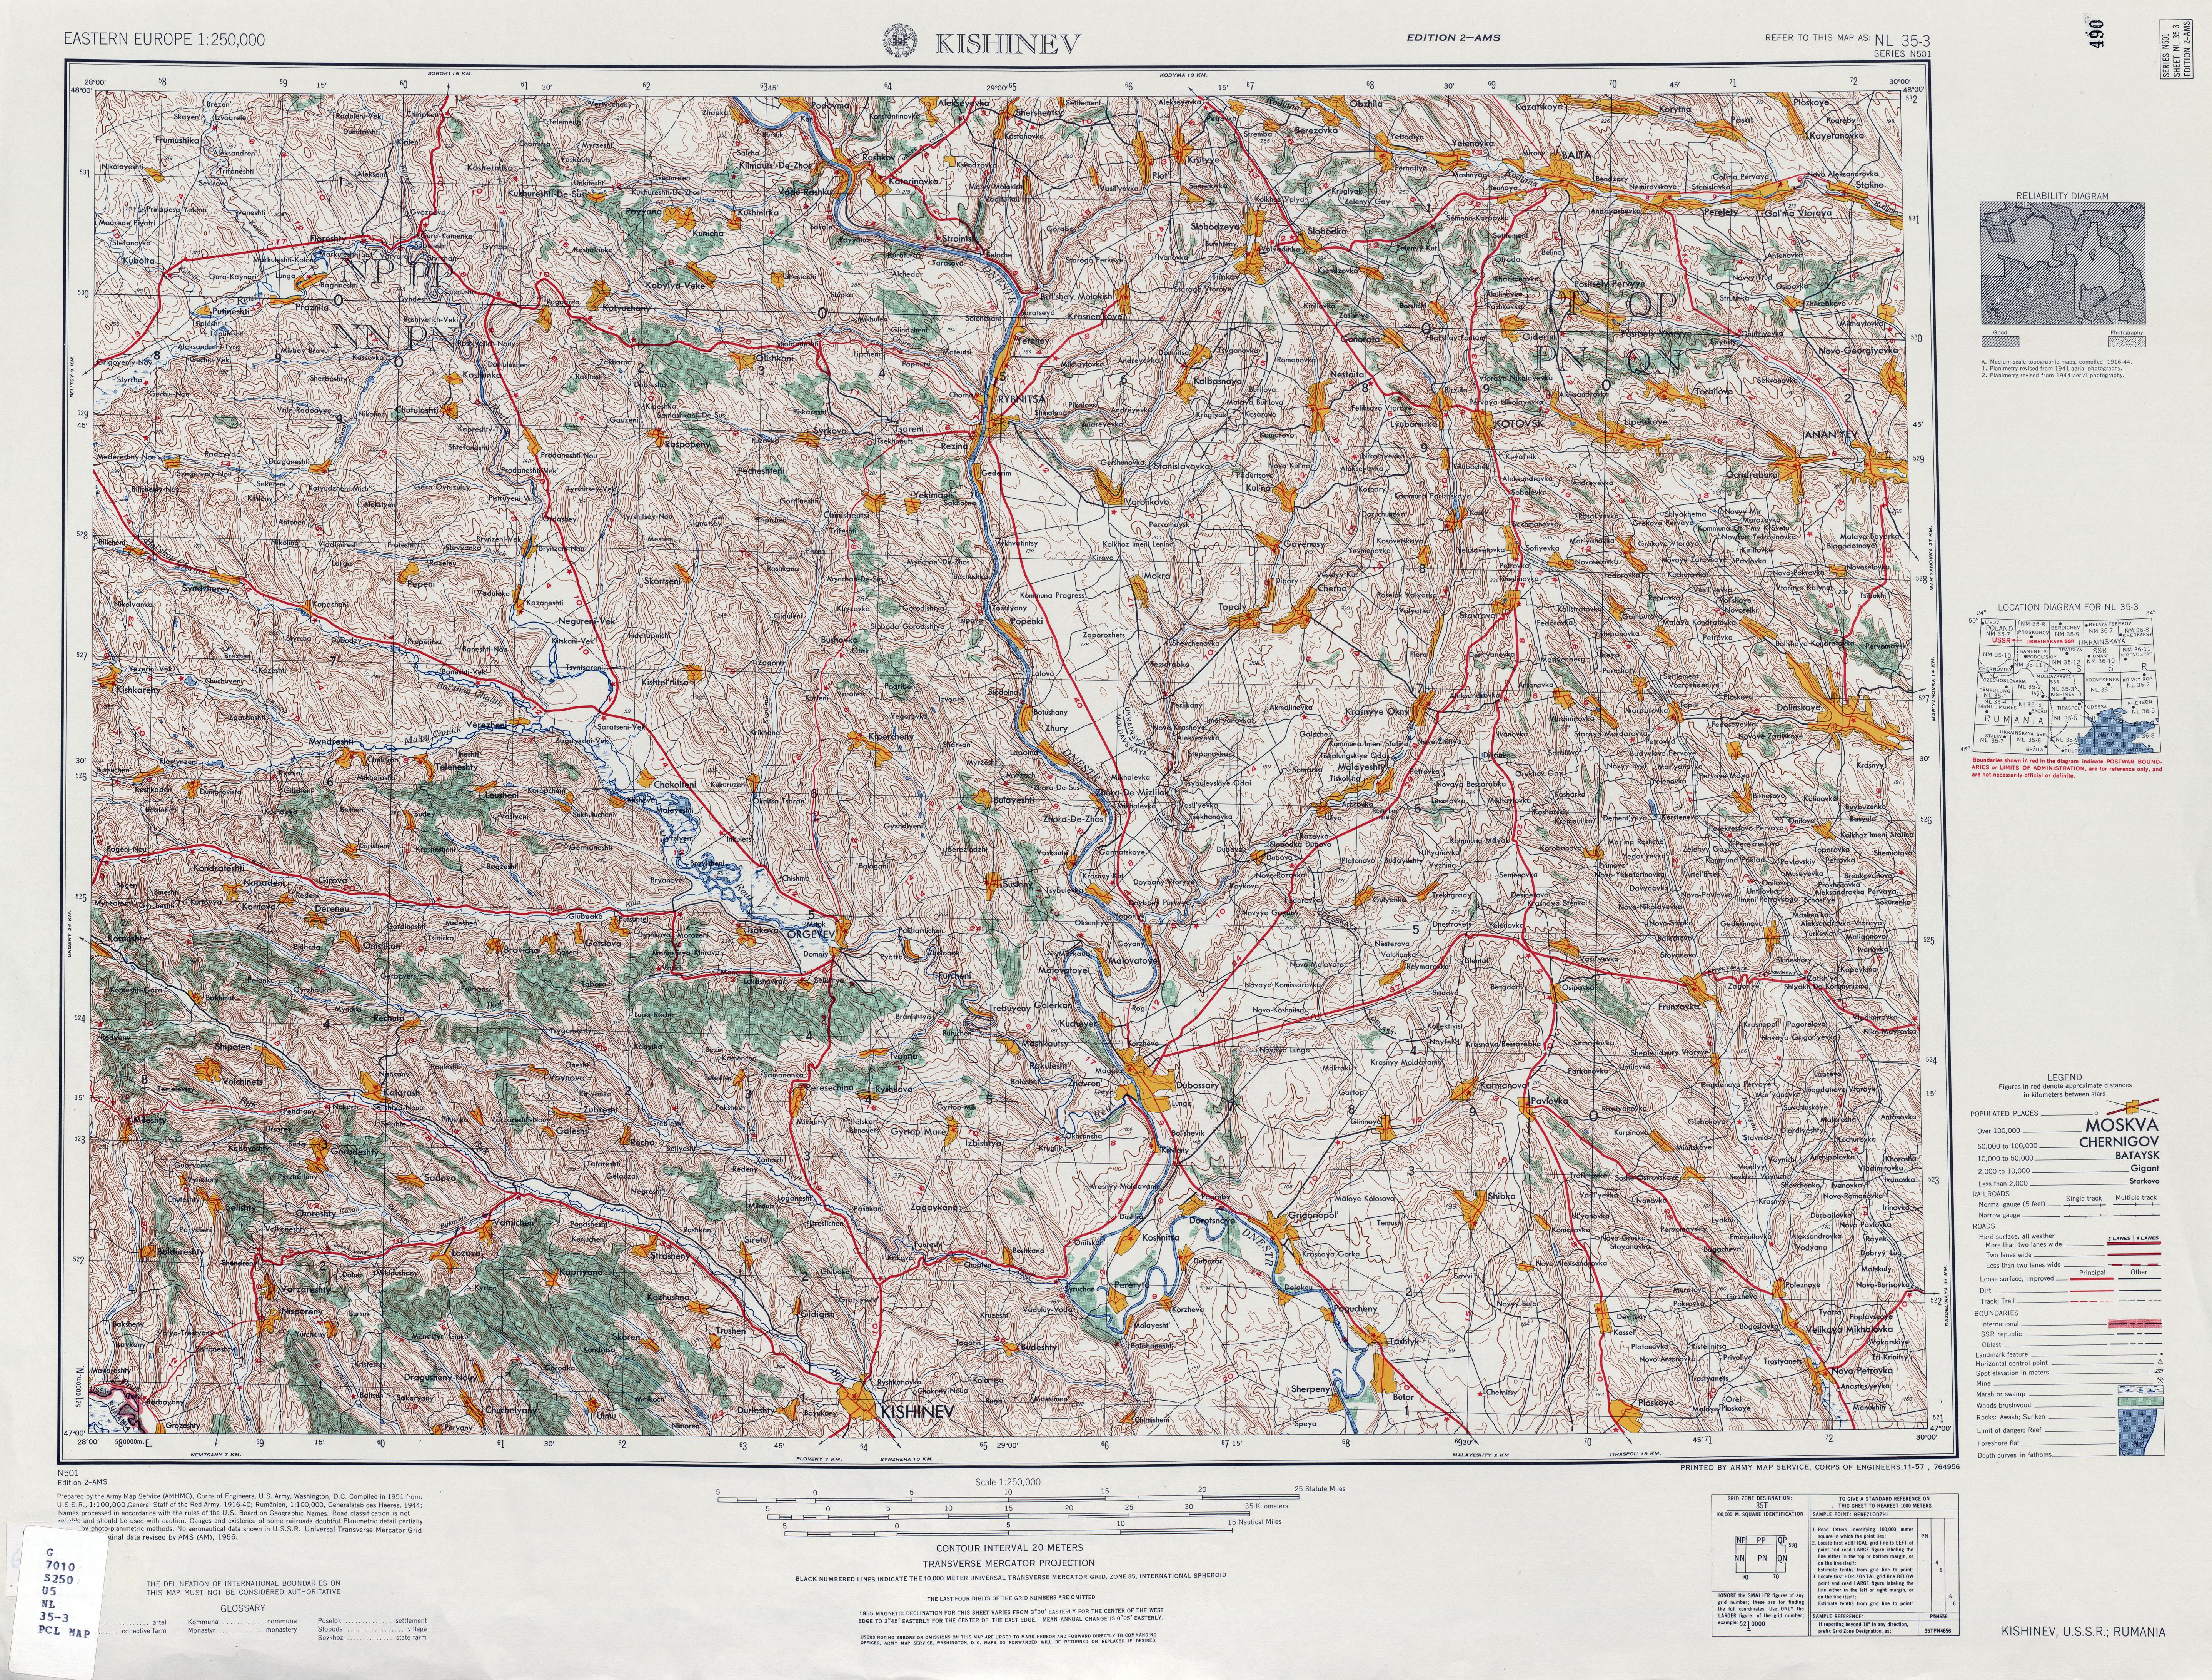 Geografilia Hărți Topografice Romania Moldova și Celelalte